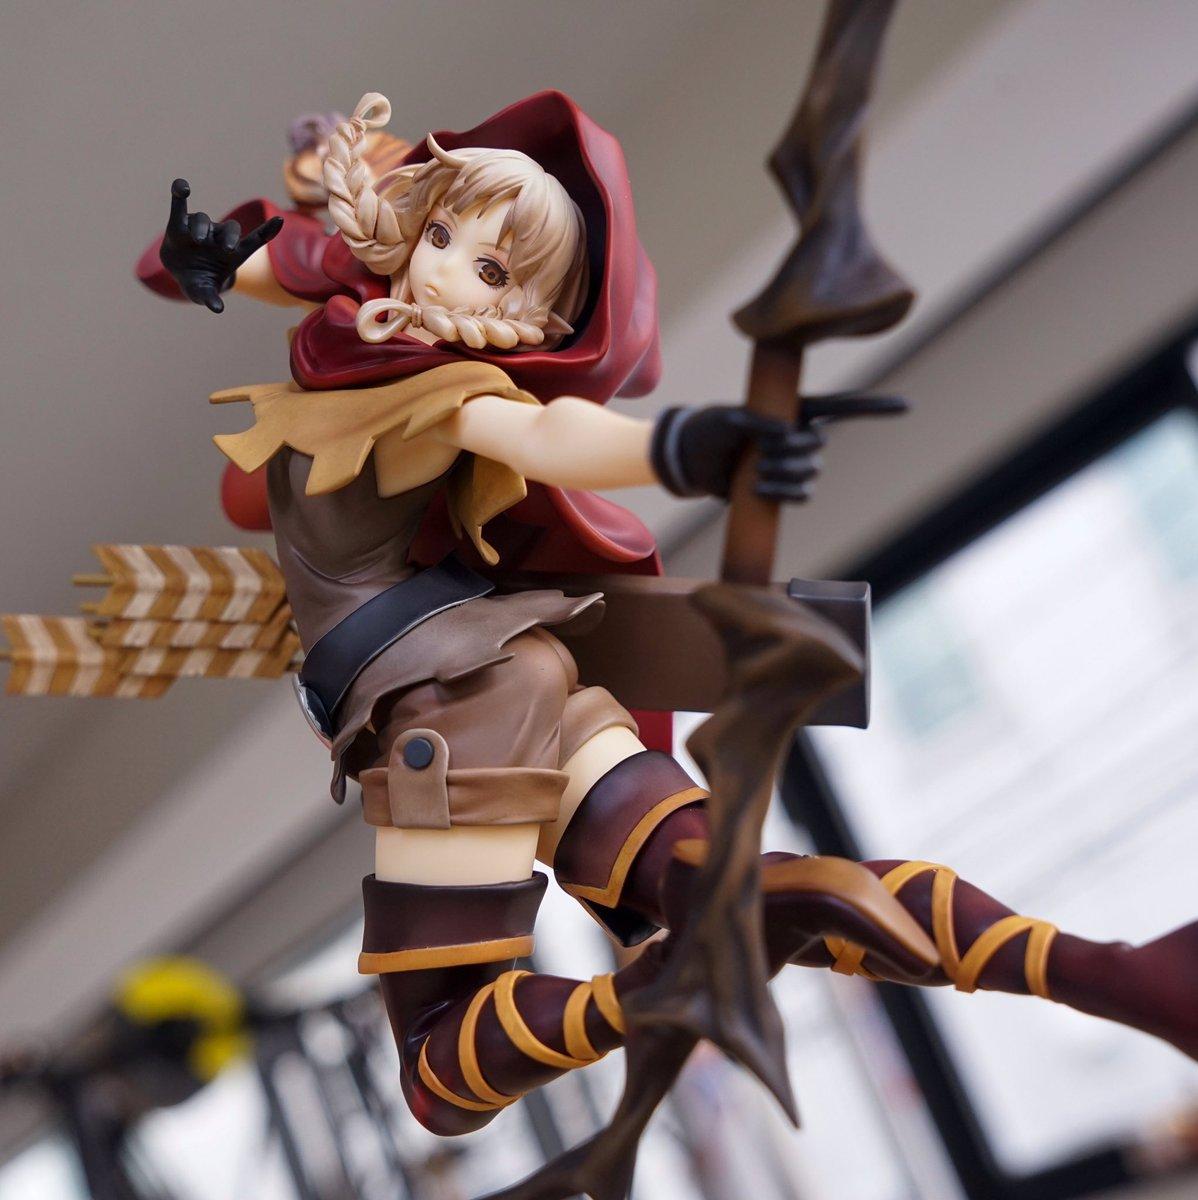 elf megahouse sega atlus excellent_model george_kamitani dragon's_crown nobuta tc